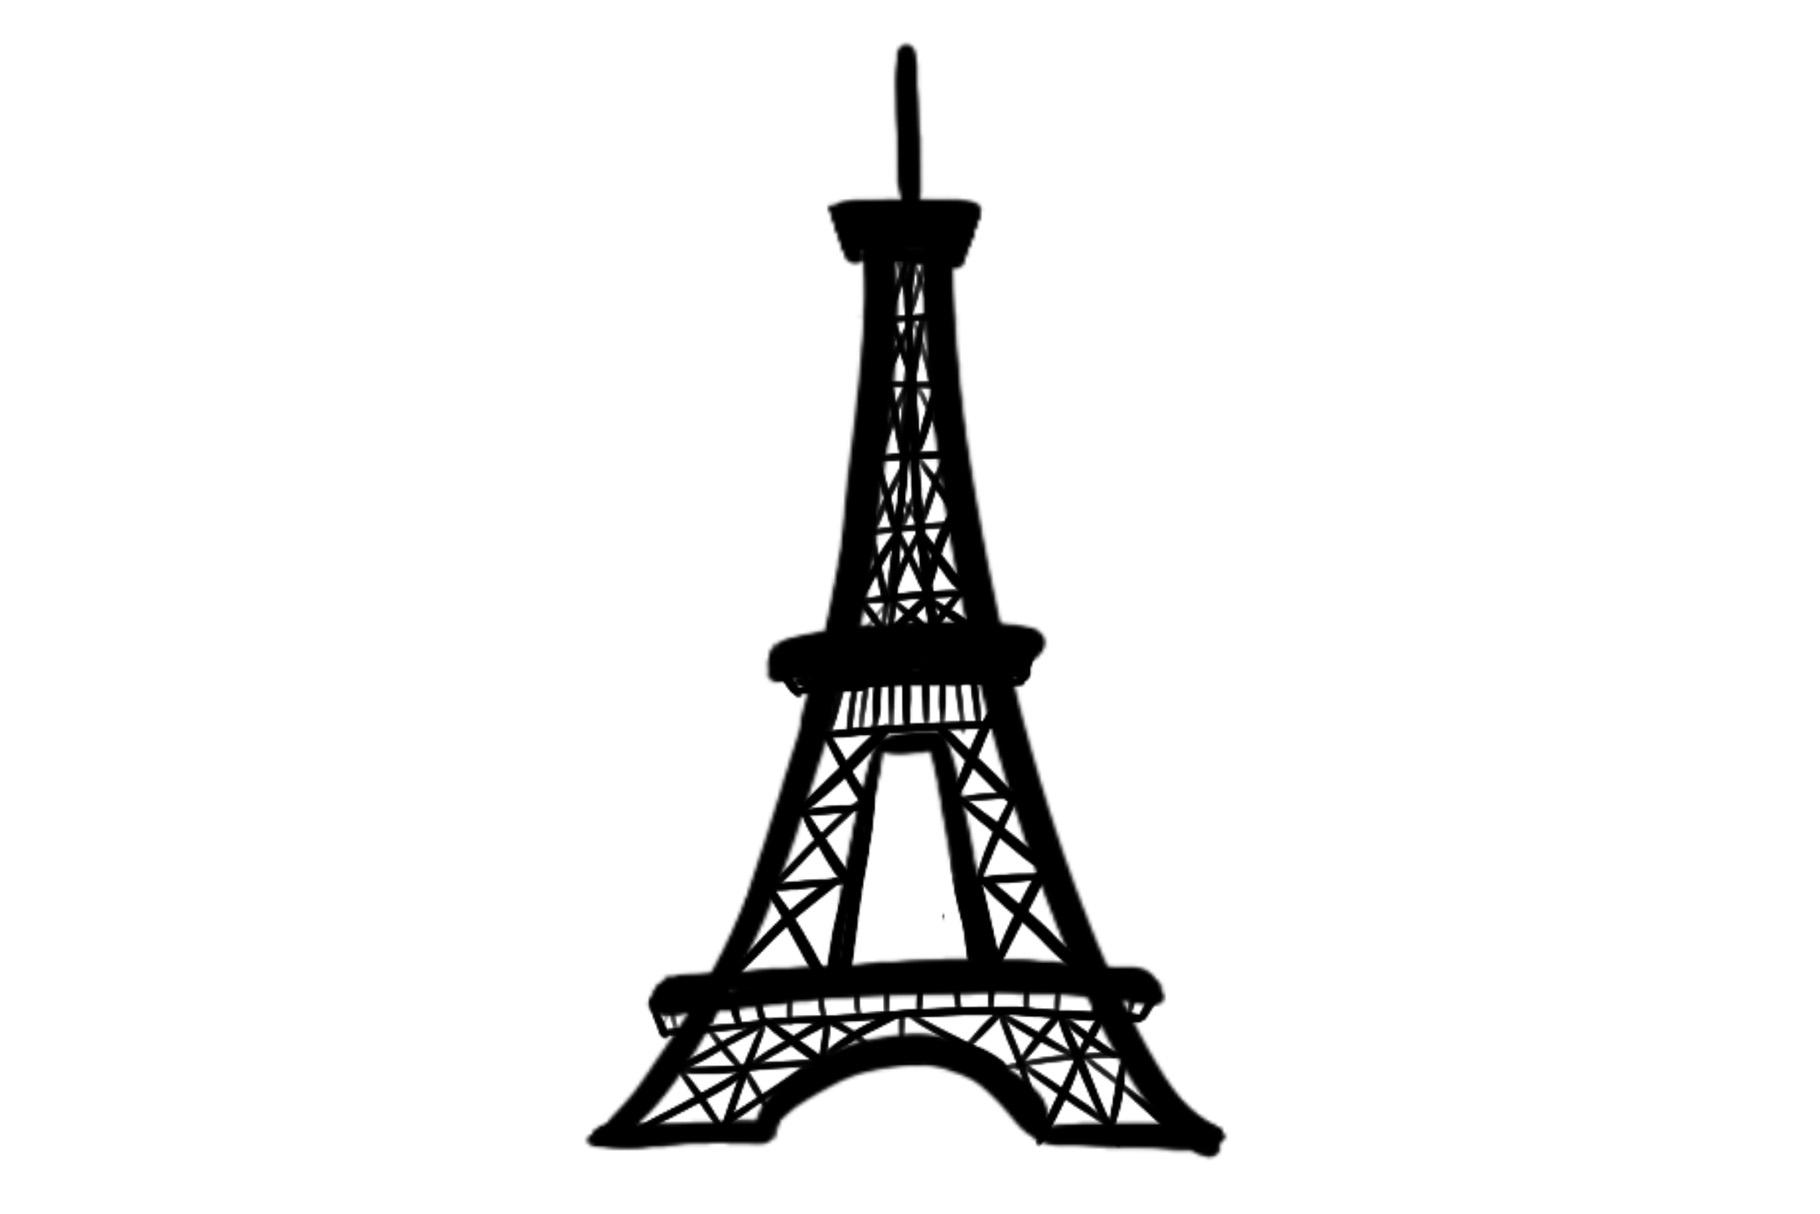 Eiffel Tower Silhouette Graphic By Sharon Dmstd